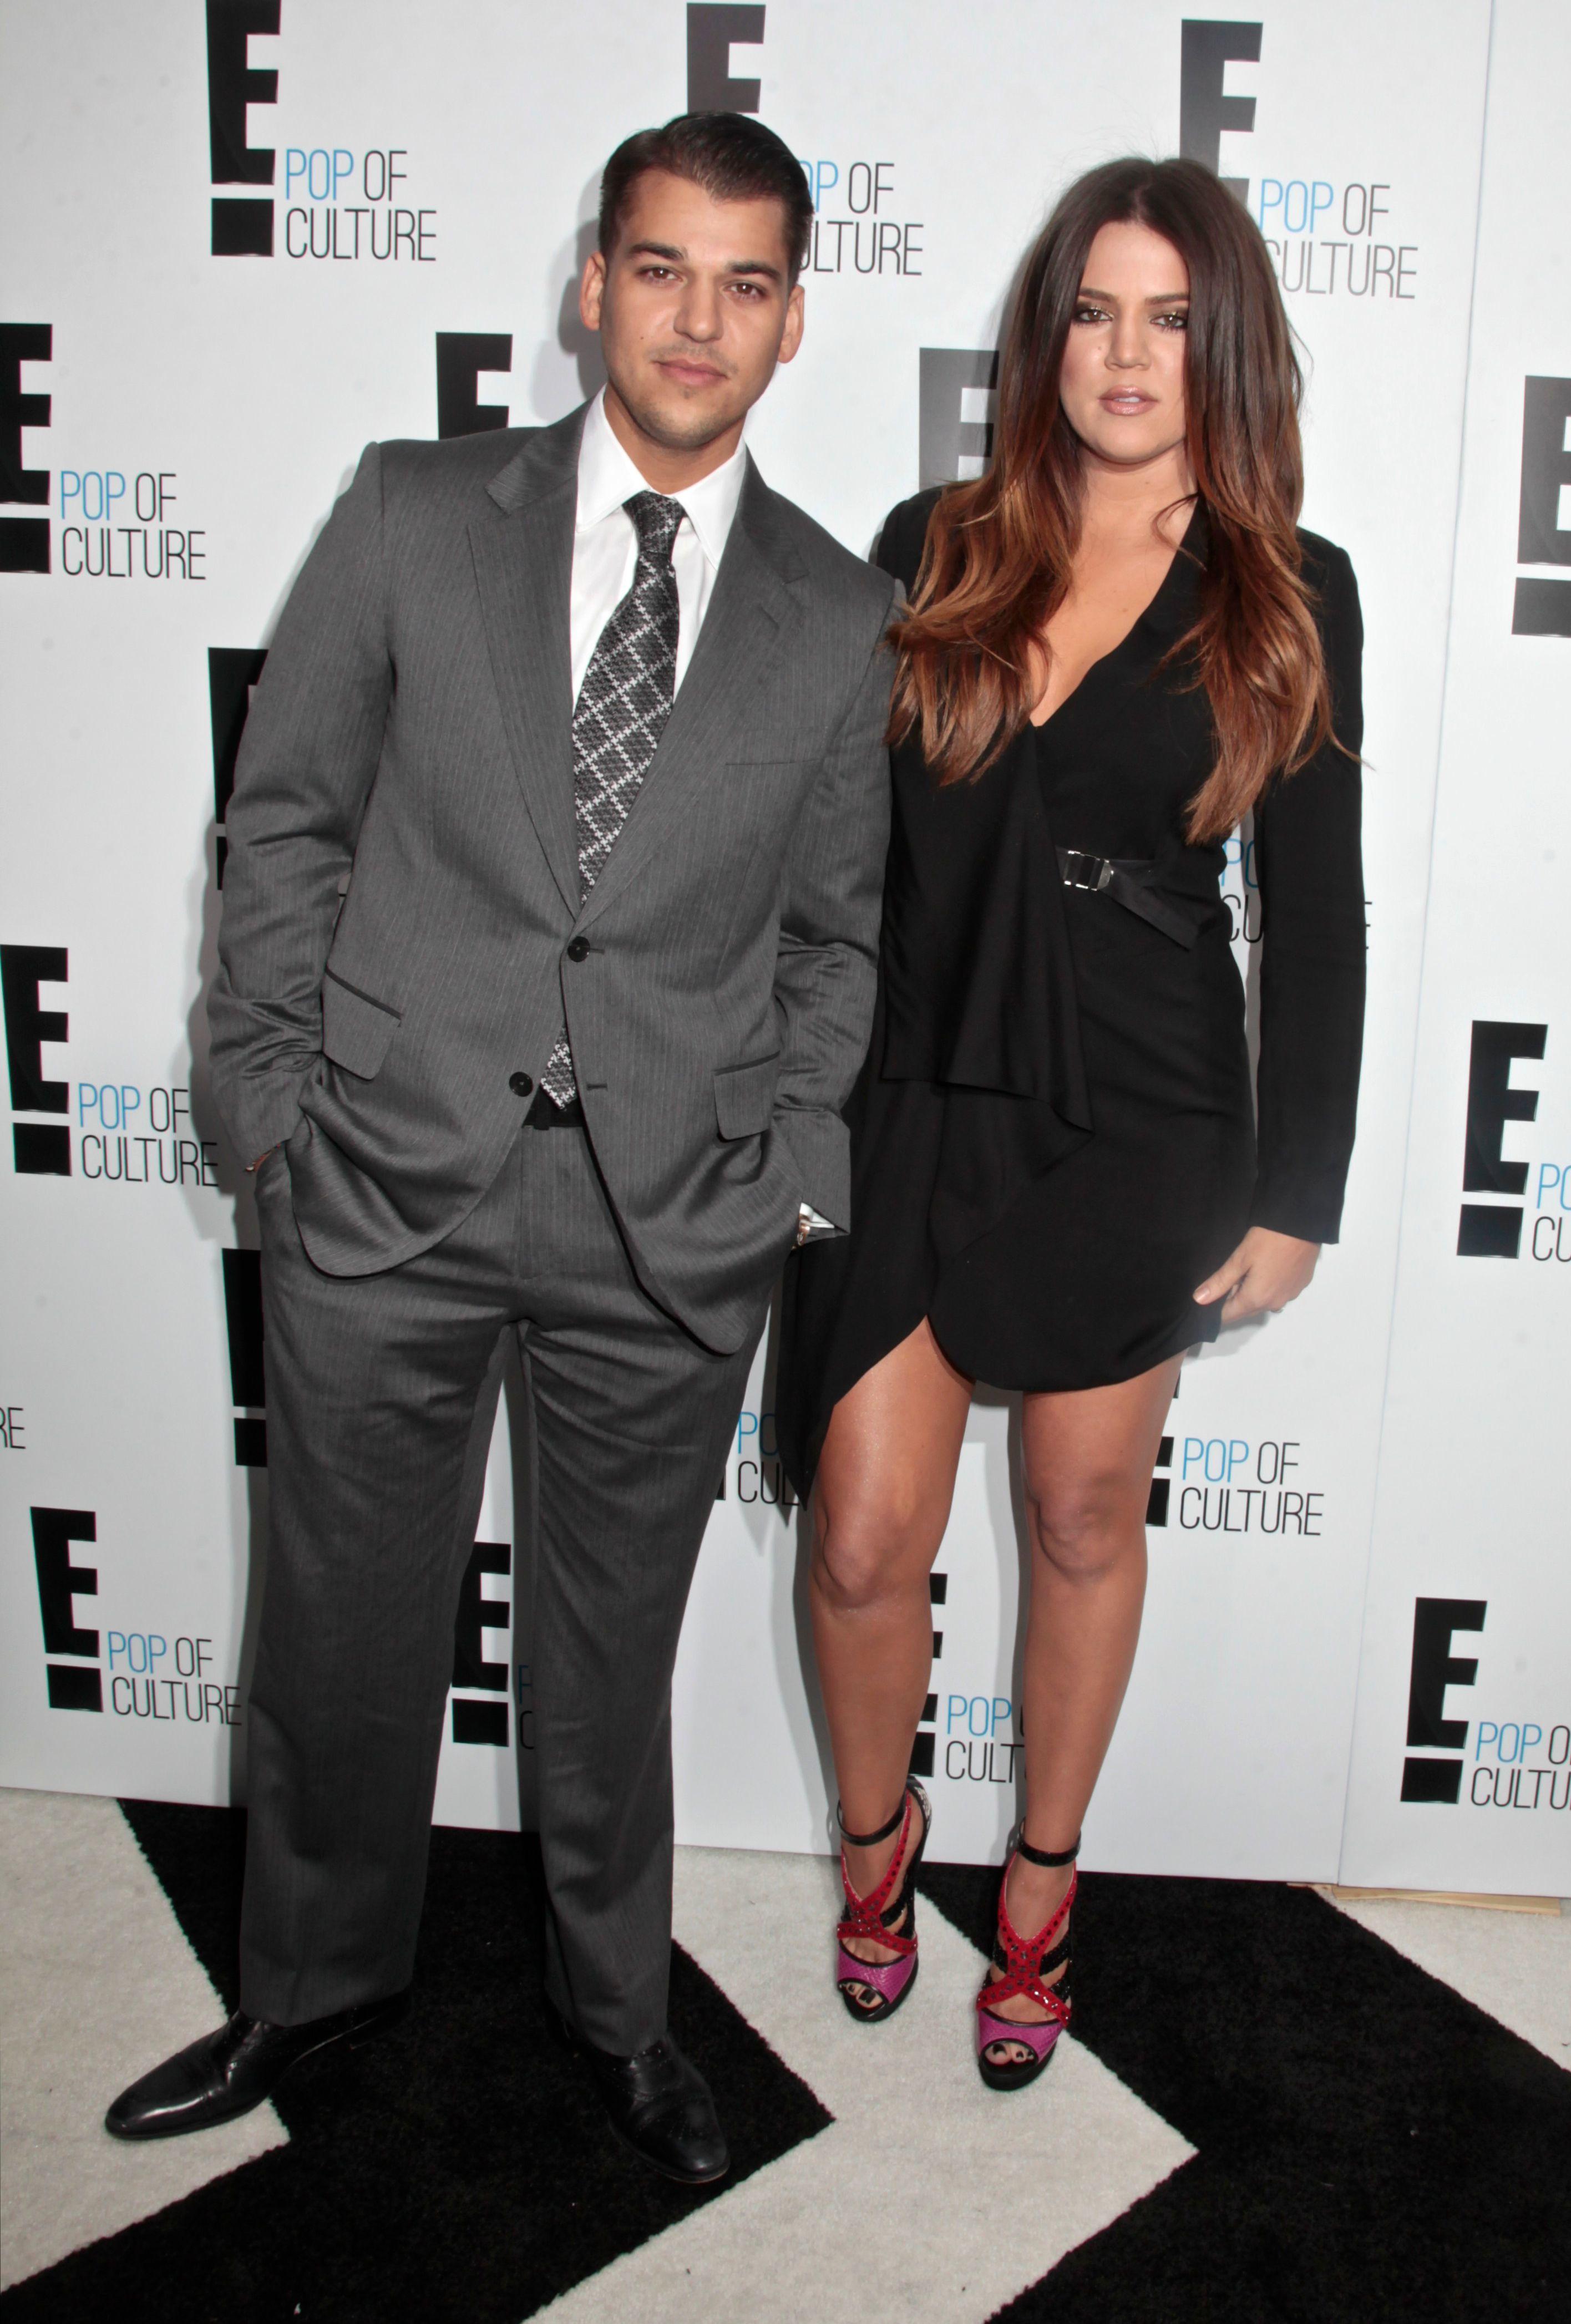 Rob Kardashian and Khloe Kardashian attend the E! Upfront presentation in New York City on April 30, 2012.